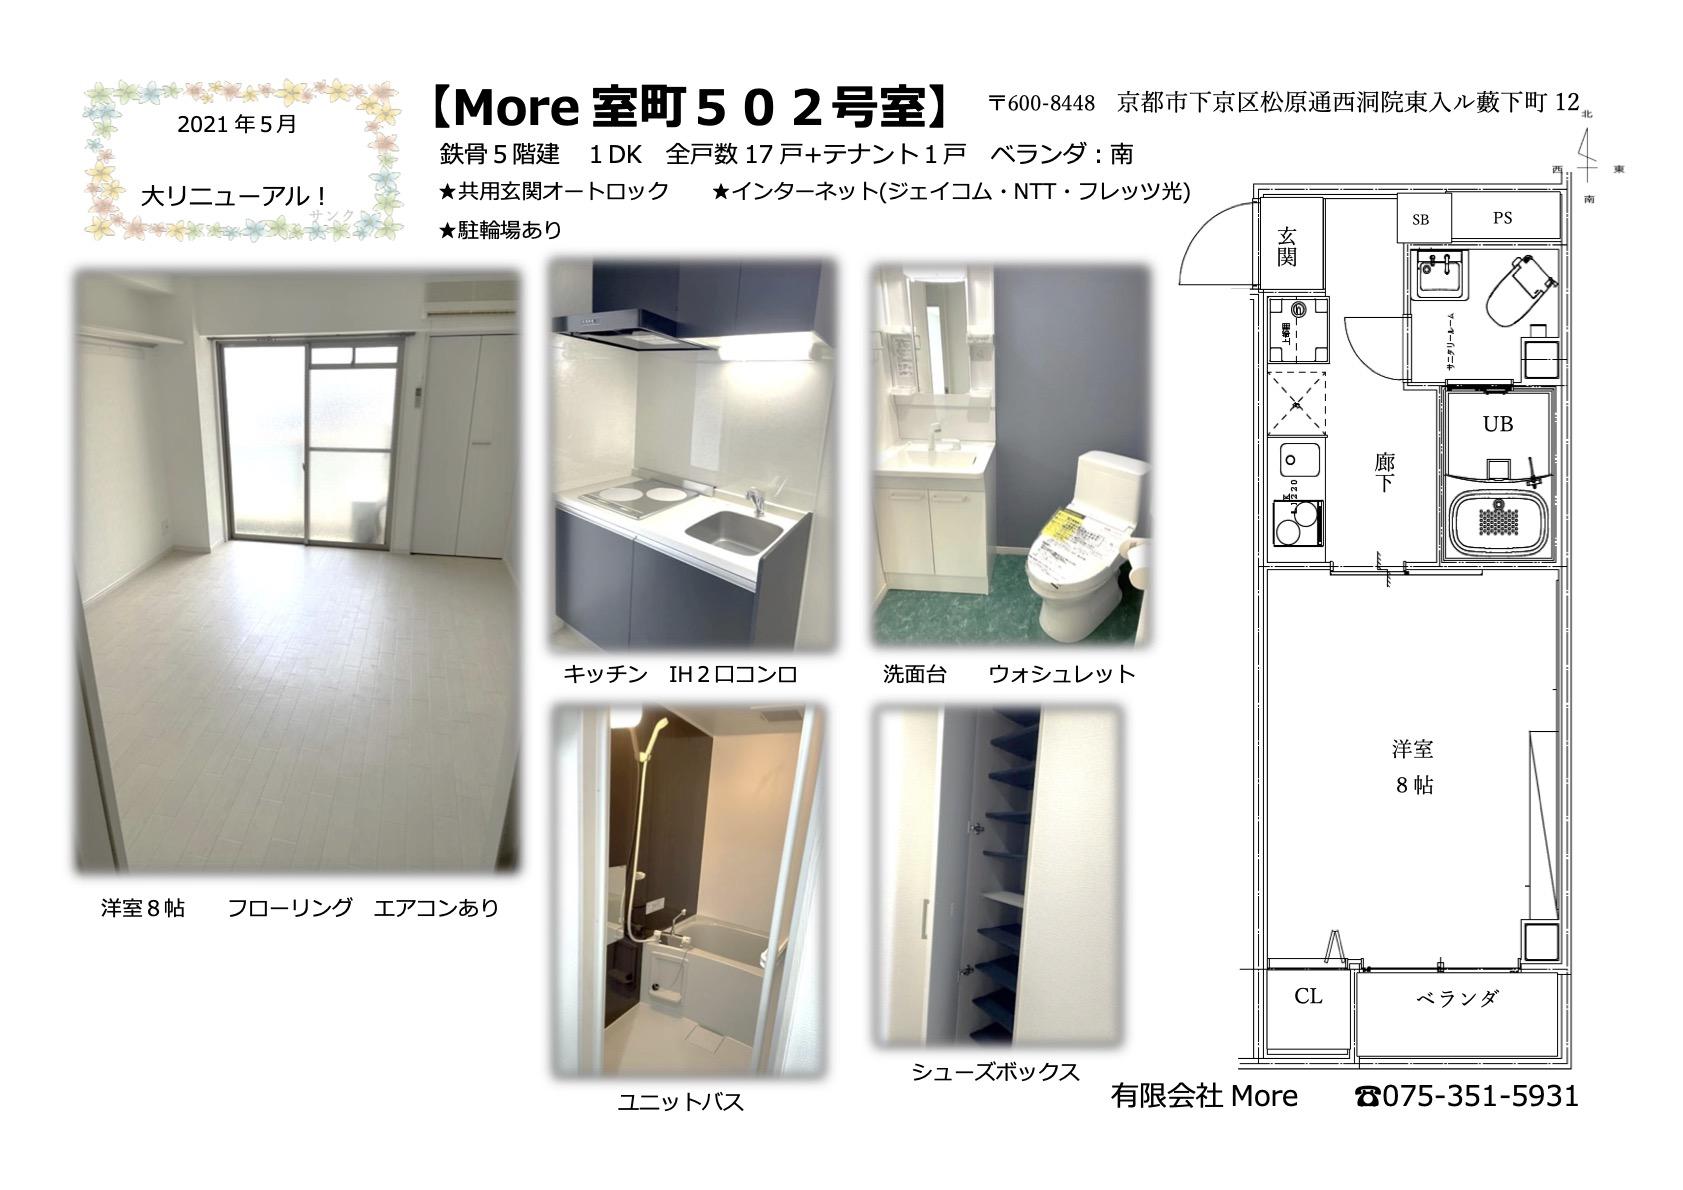 More室町 502号室